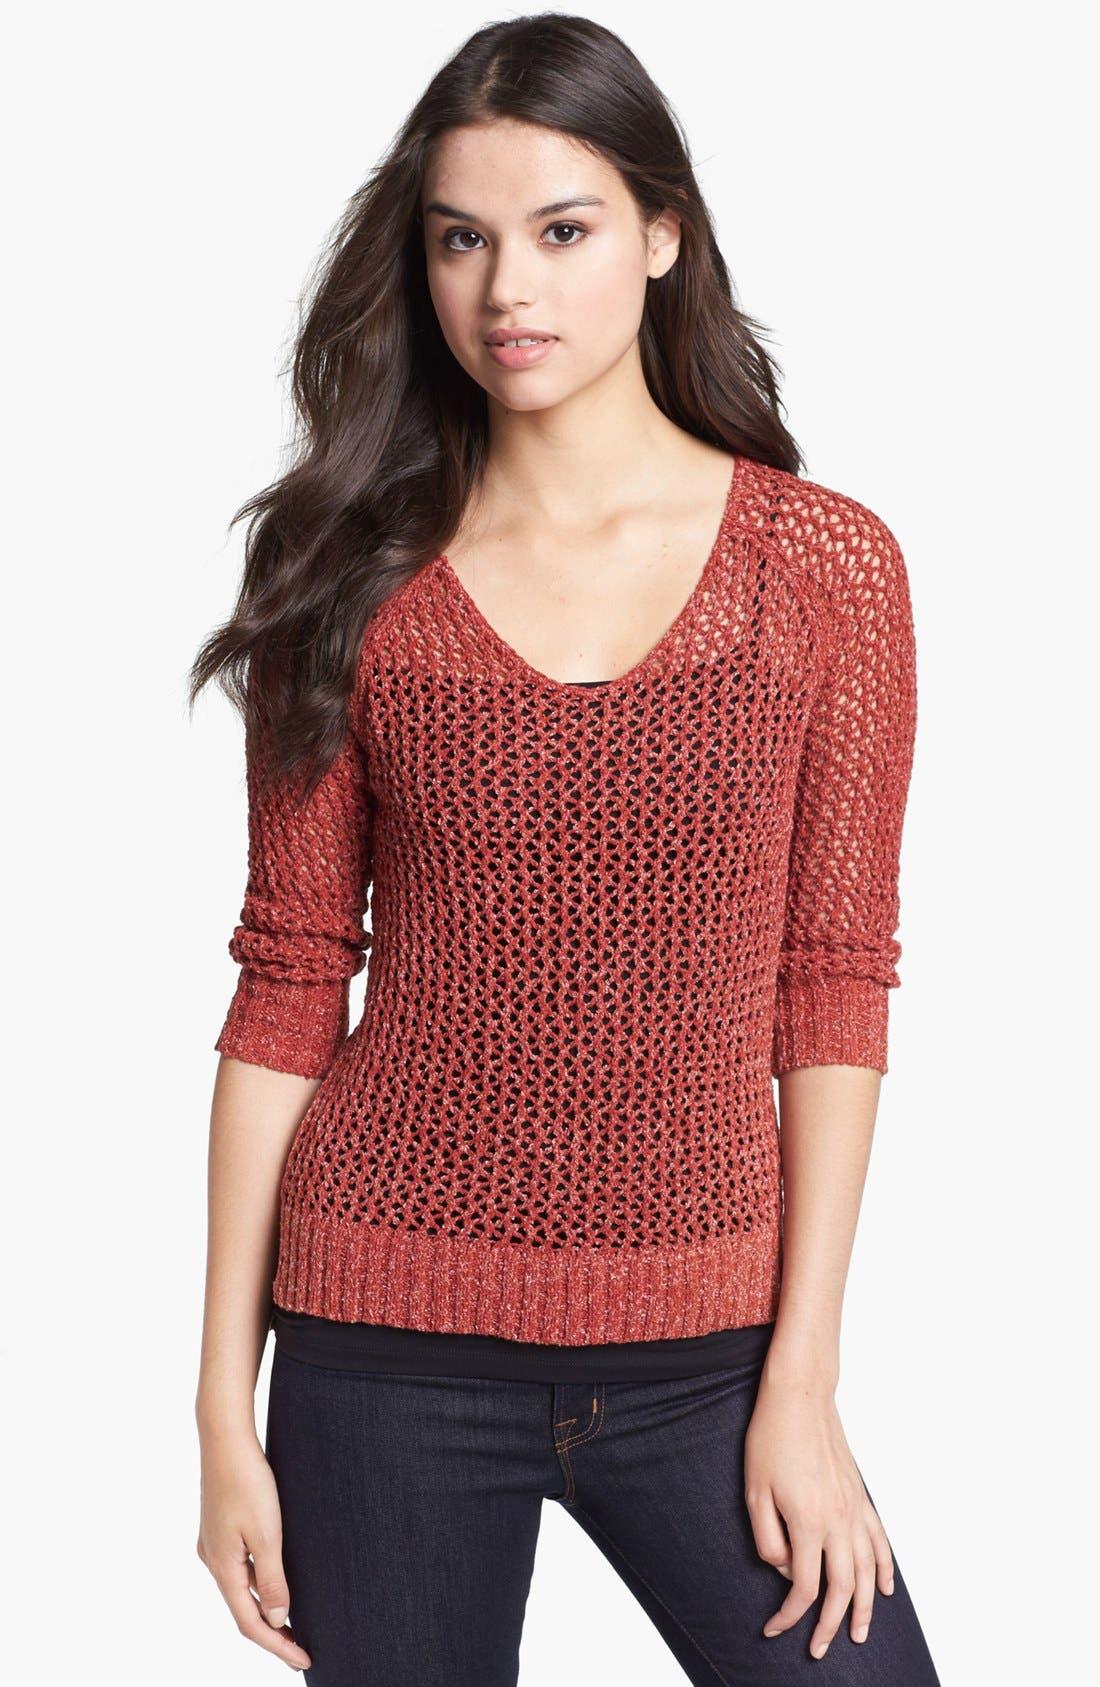 Alternate Image 1 Selected - Lucky Brand 'Cerise' Open Stitch Sweater